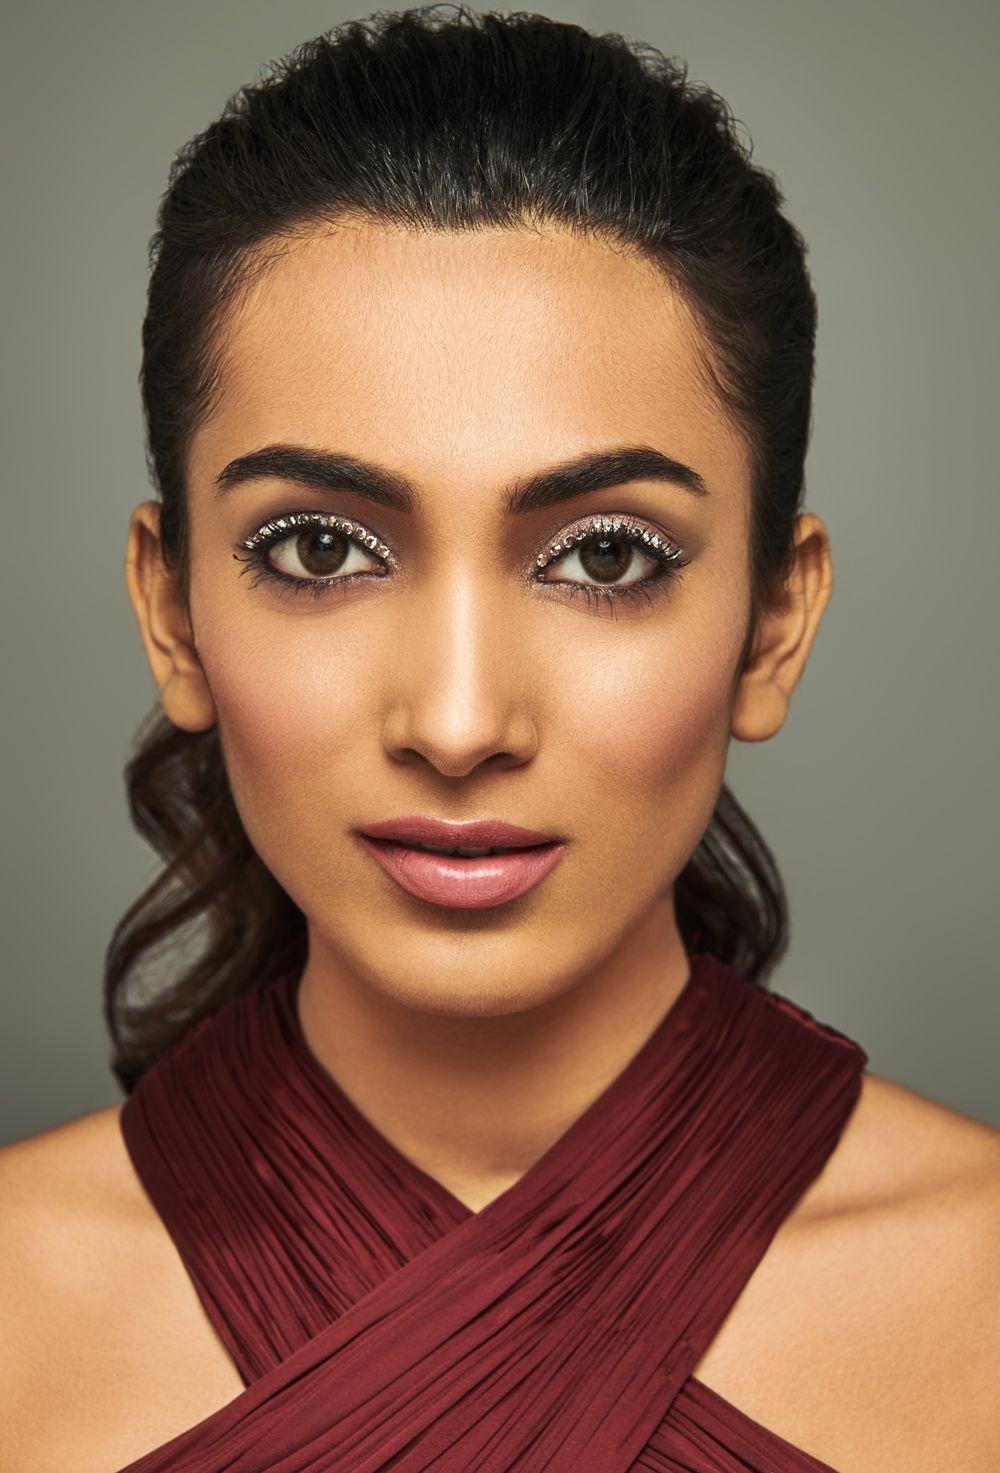 Cosmic queen vaishnavi andhale indian model beauty pageant